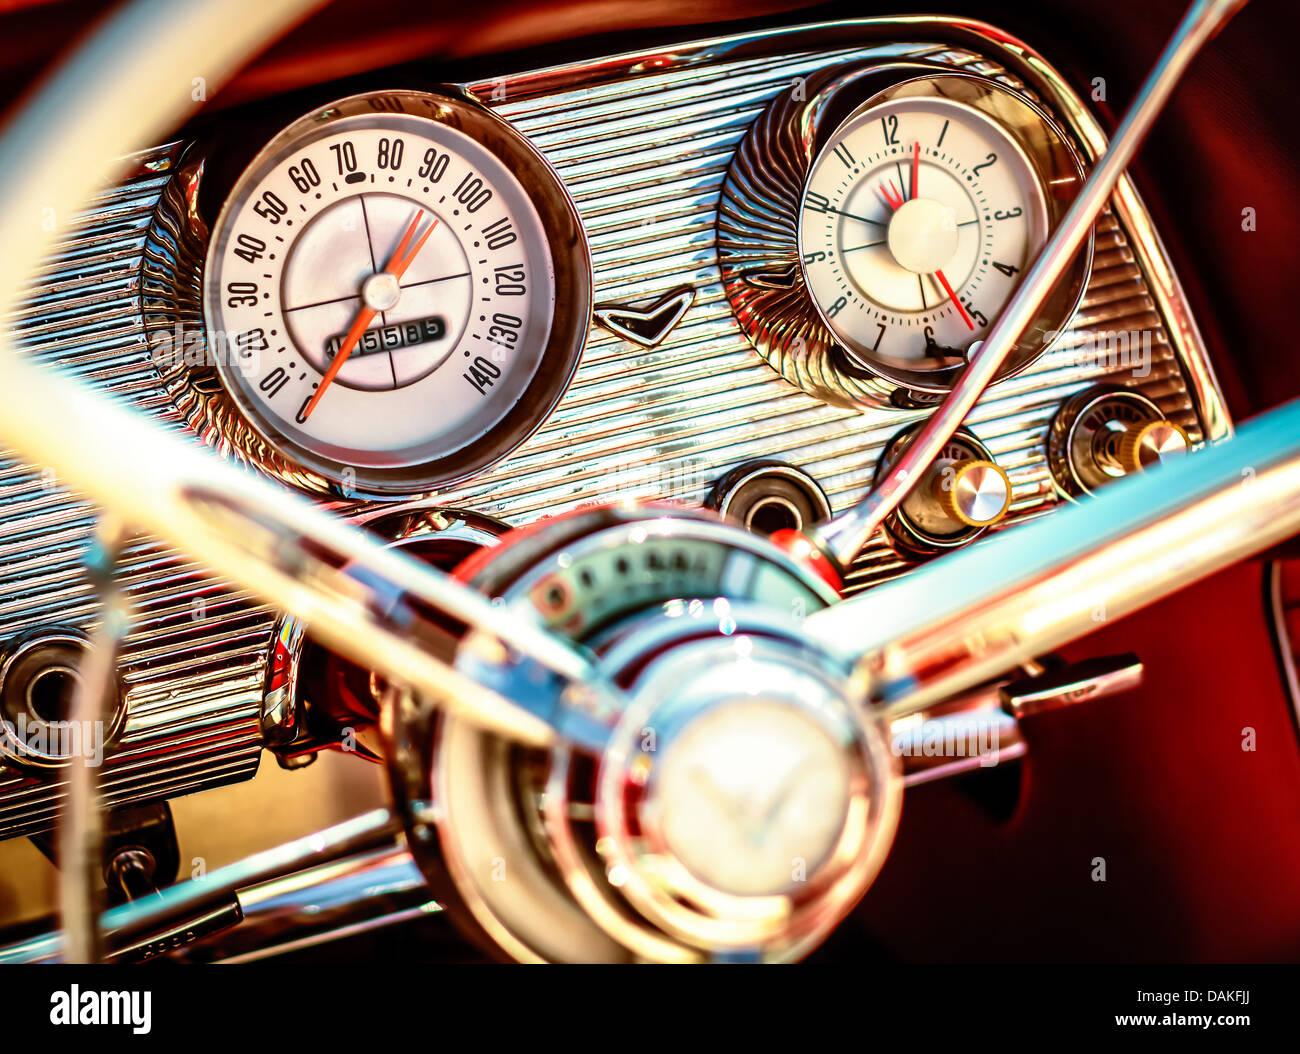 1960 Ford Thunderbird Dash - Stock Image